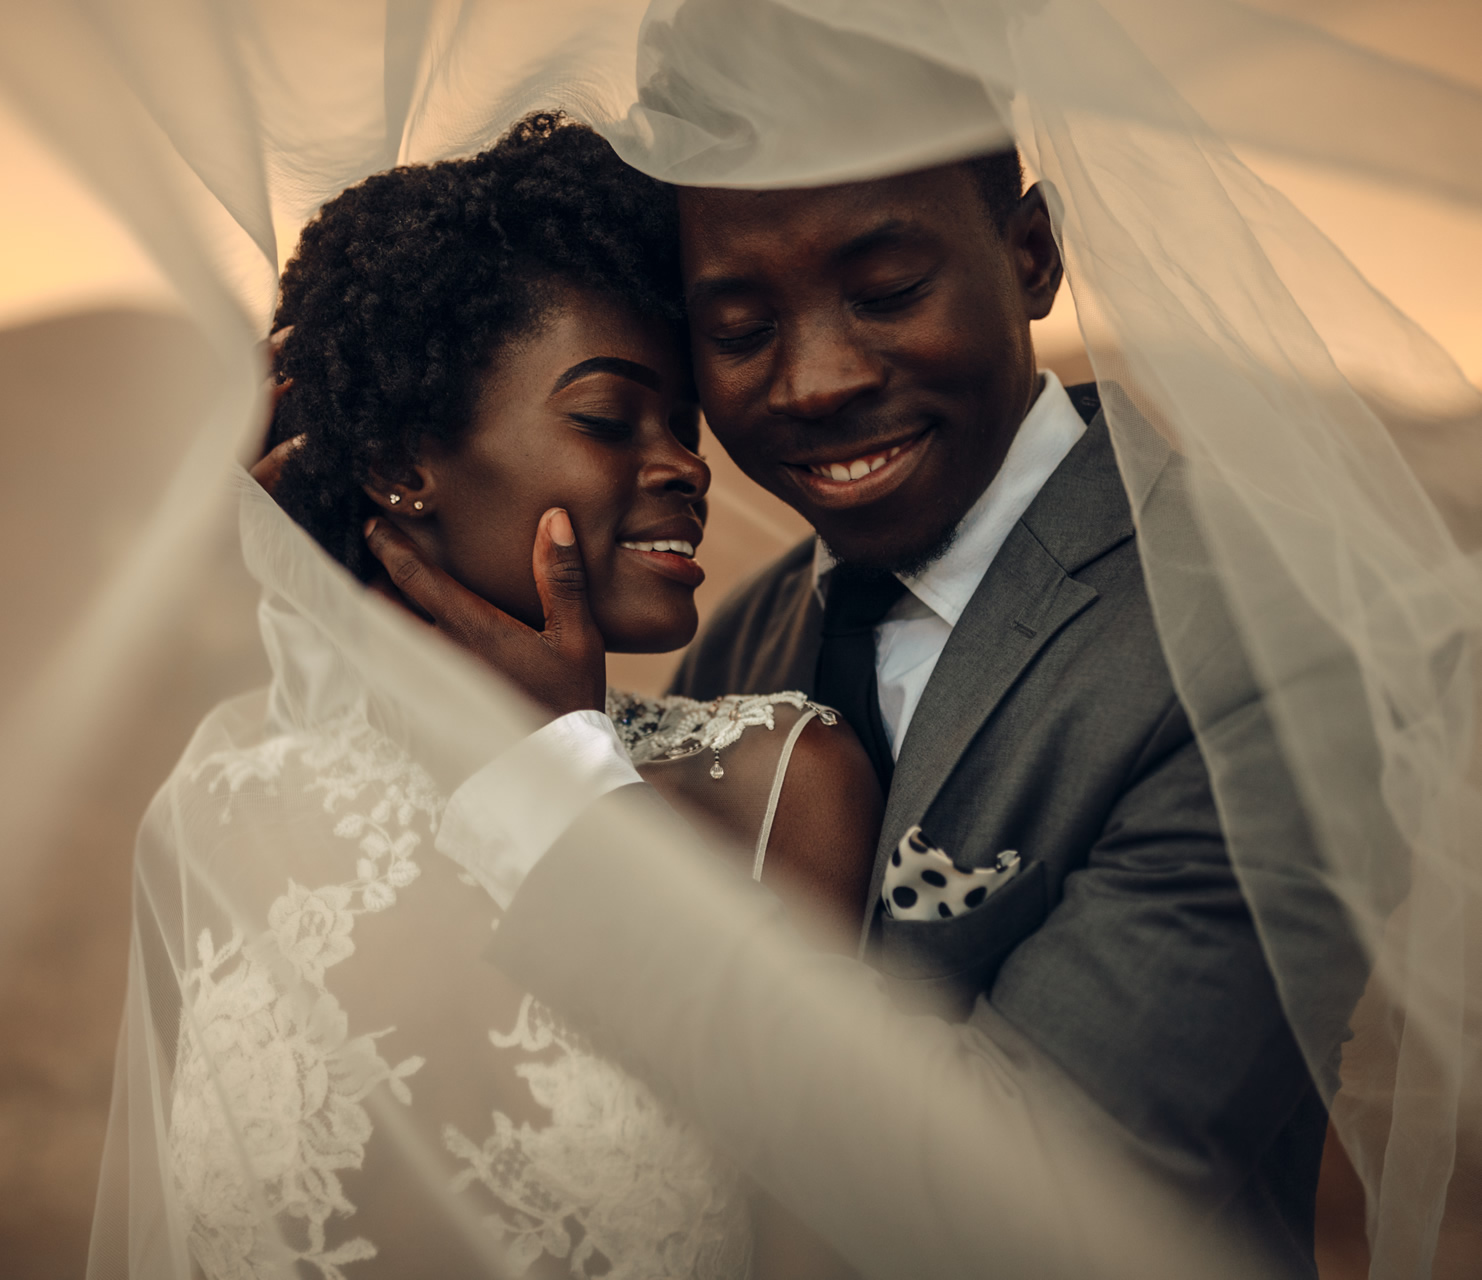 bride and groom wedding image